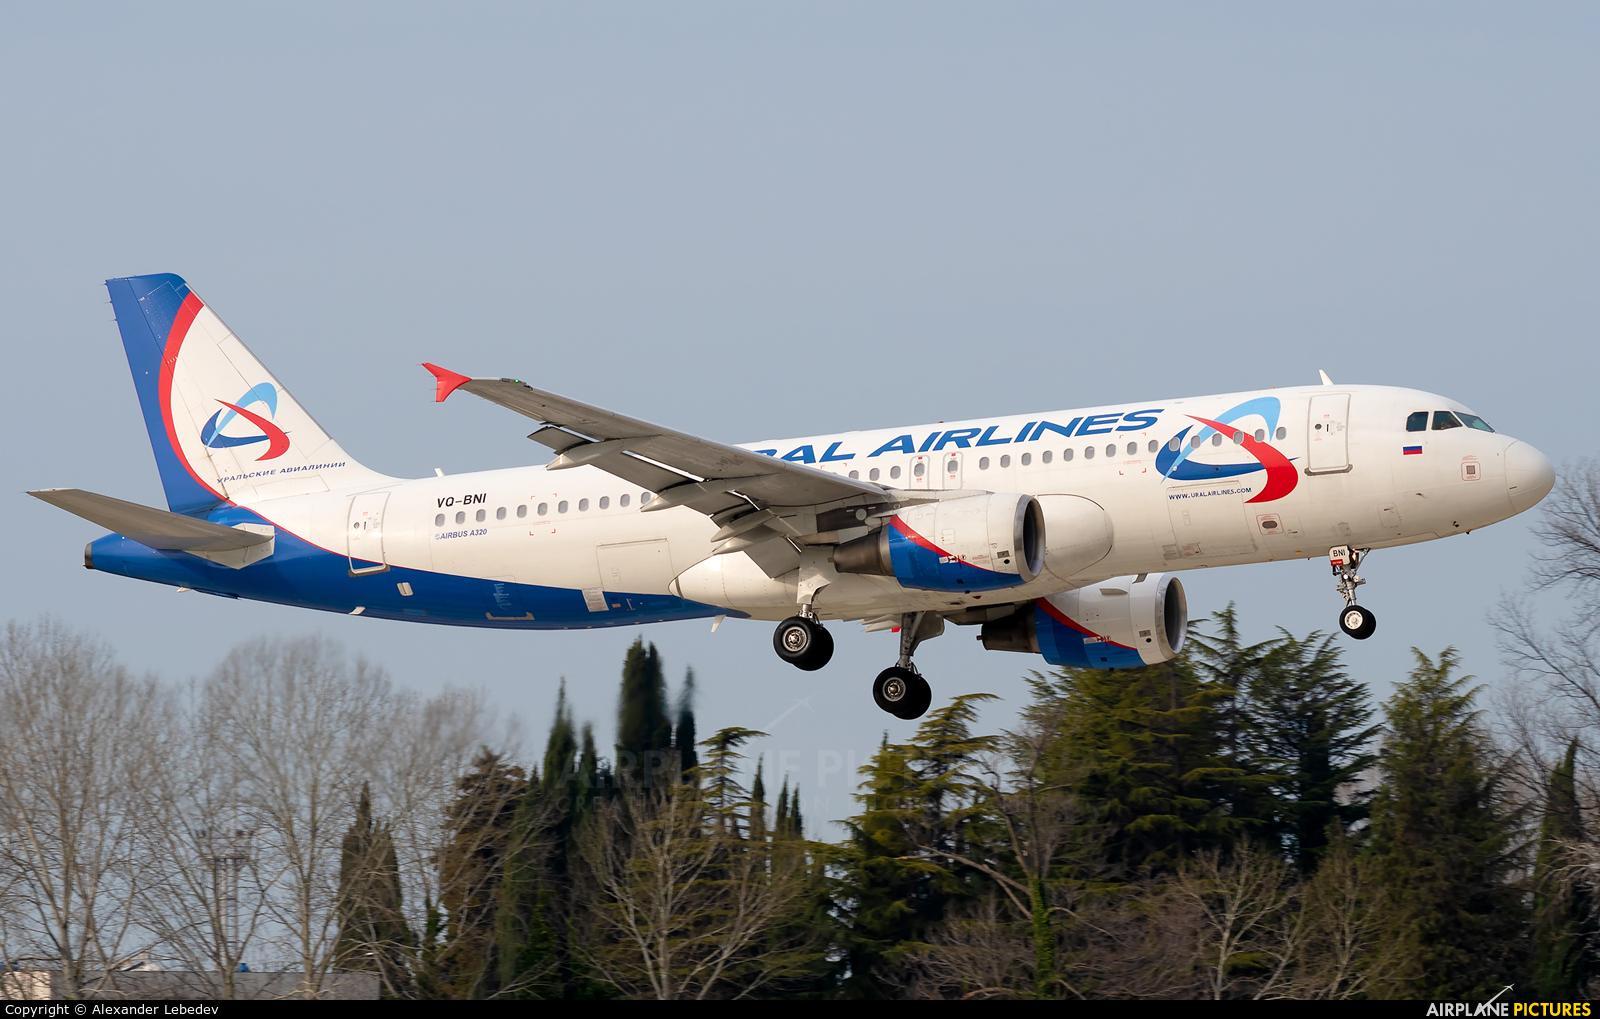 Ural Airlines VQ-BNI aircraft at Sochi Intl